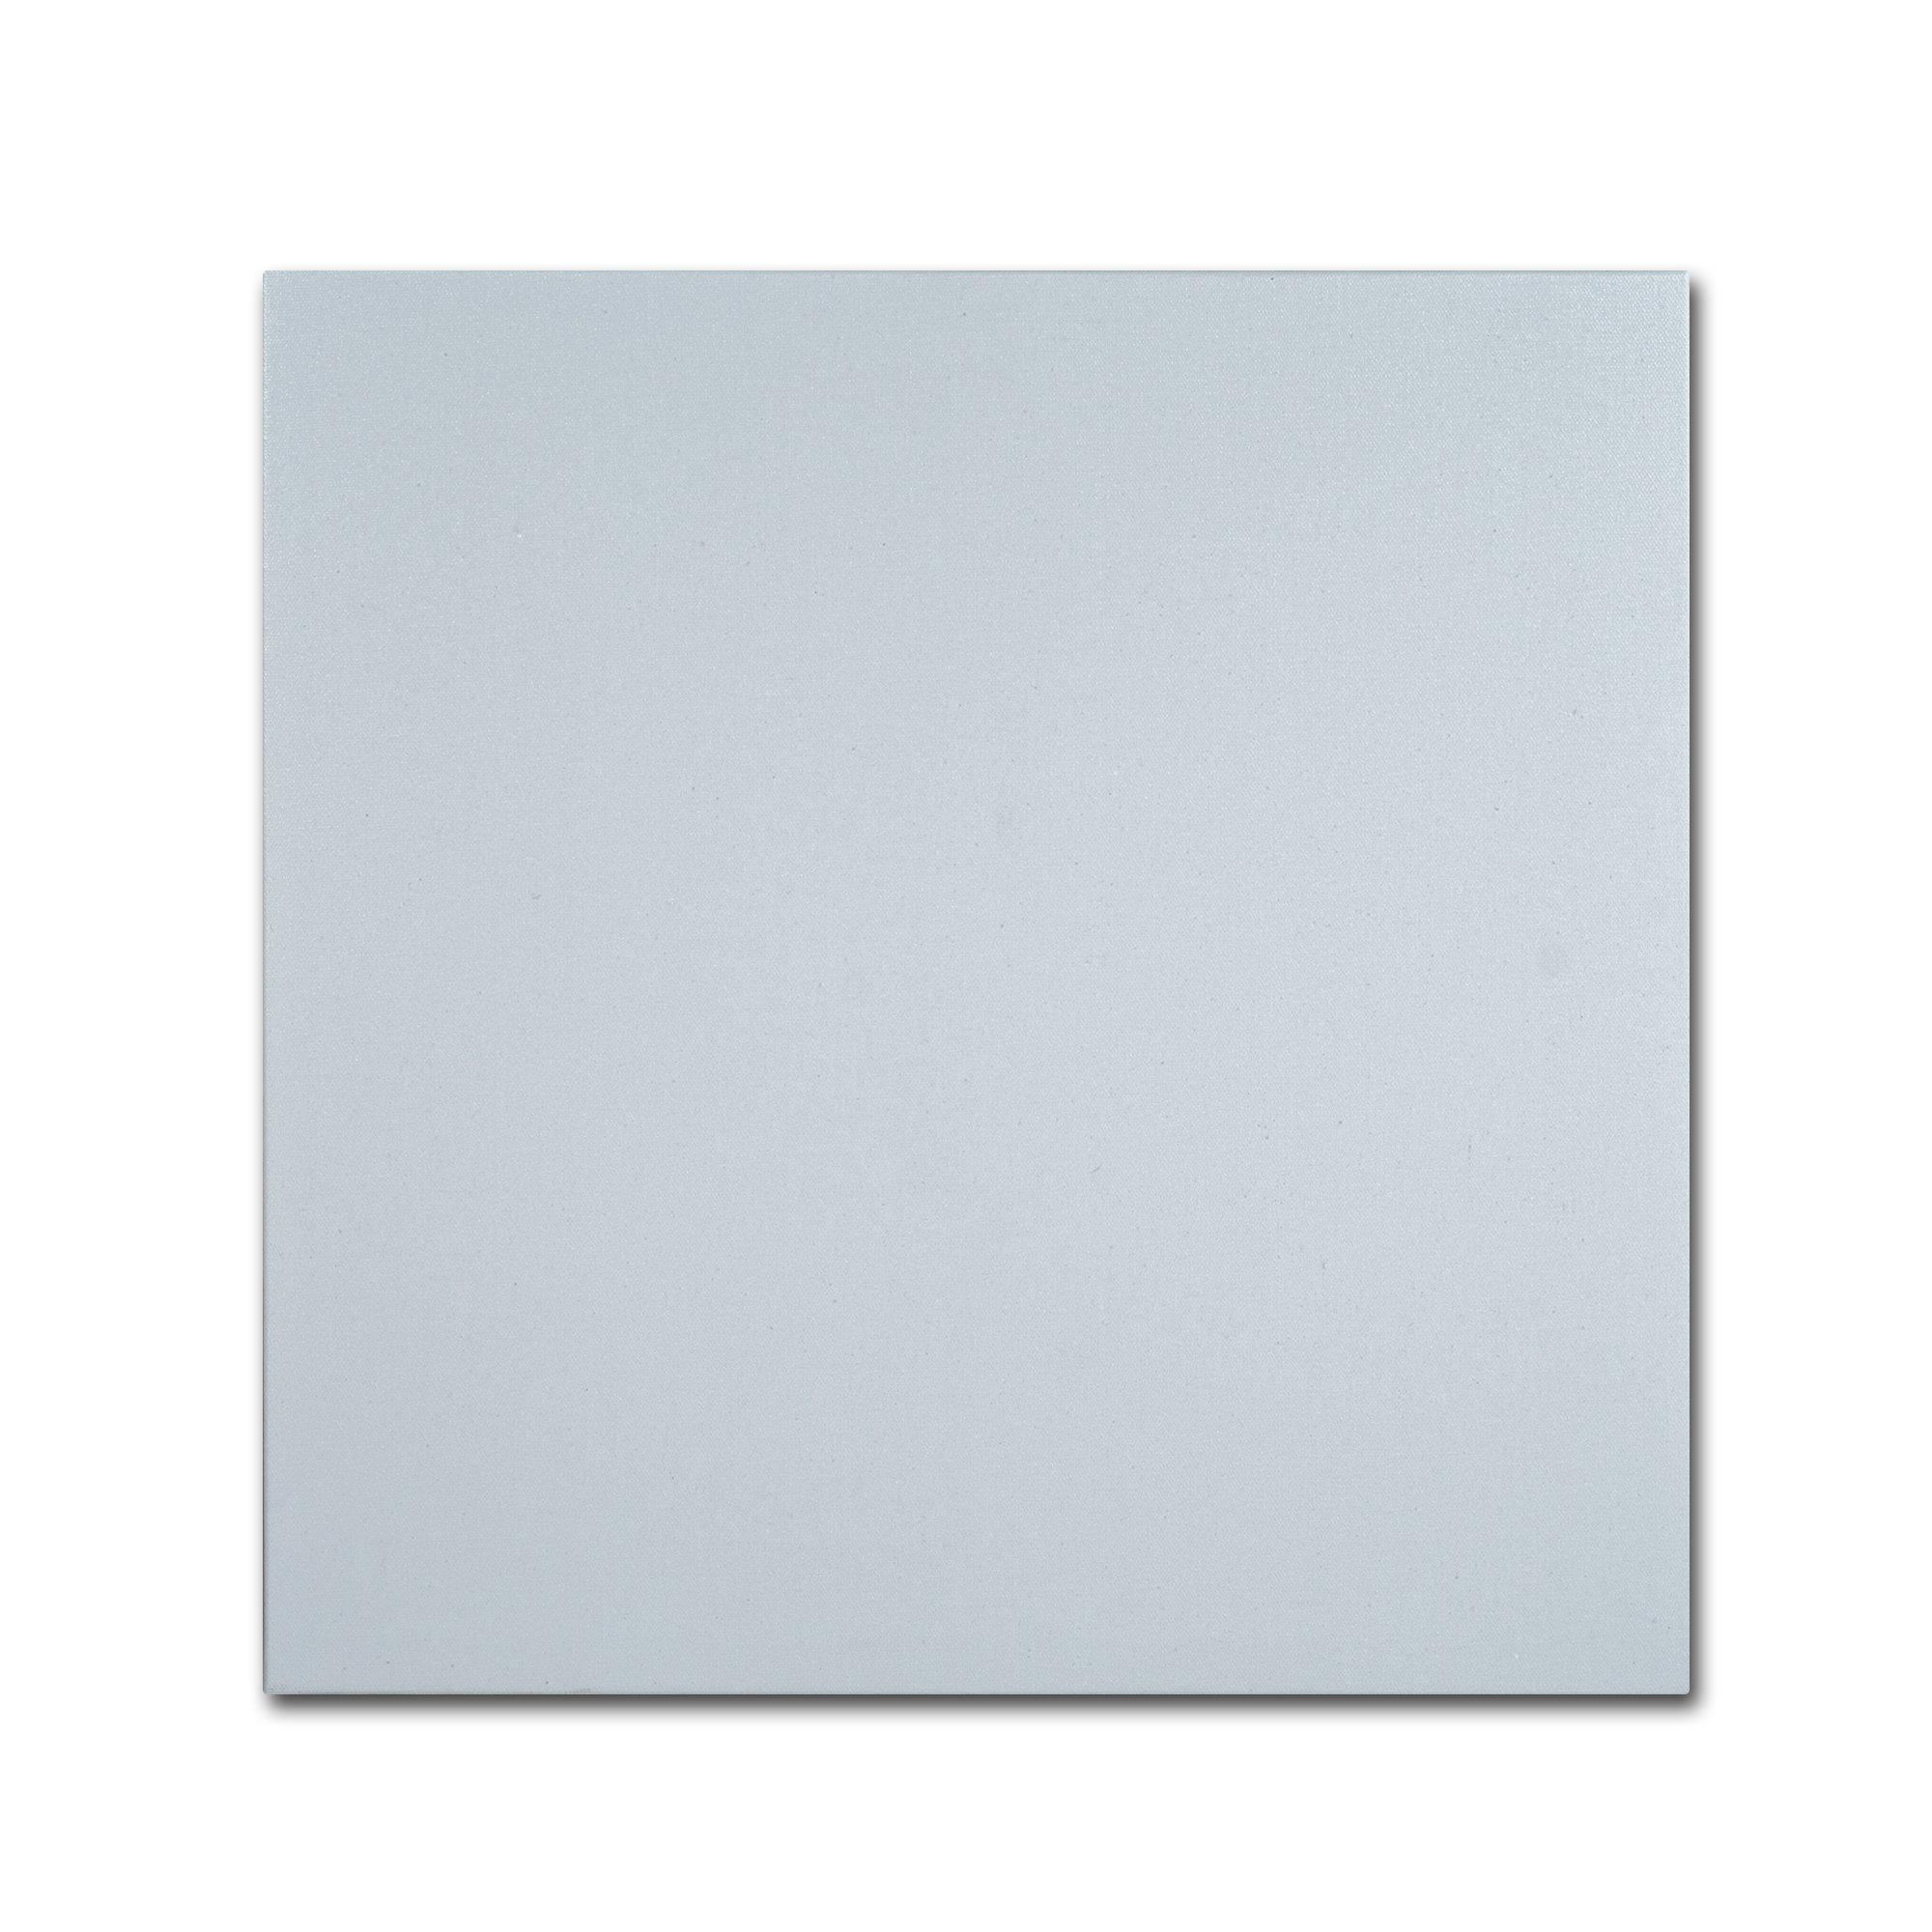 Trademark Fine Art Professional Blank Canvas on Stretcher Bars, 35'' x 35'', White